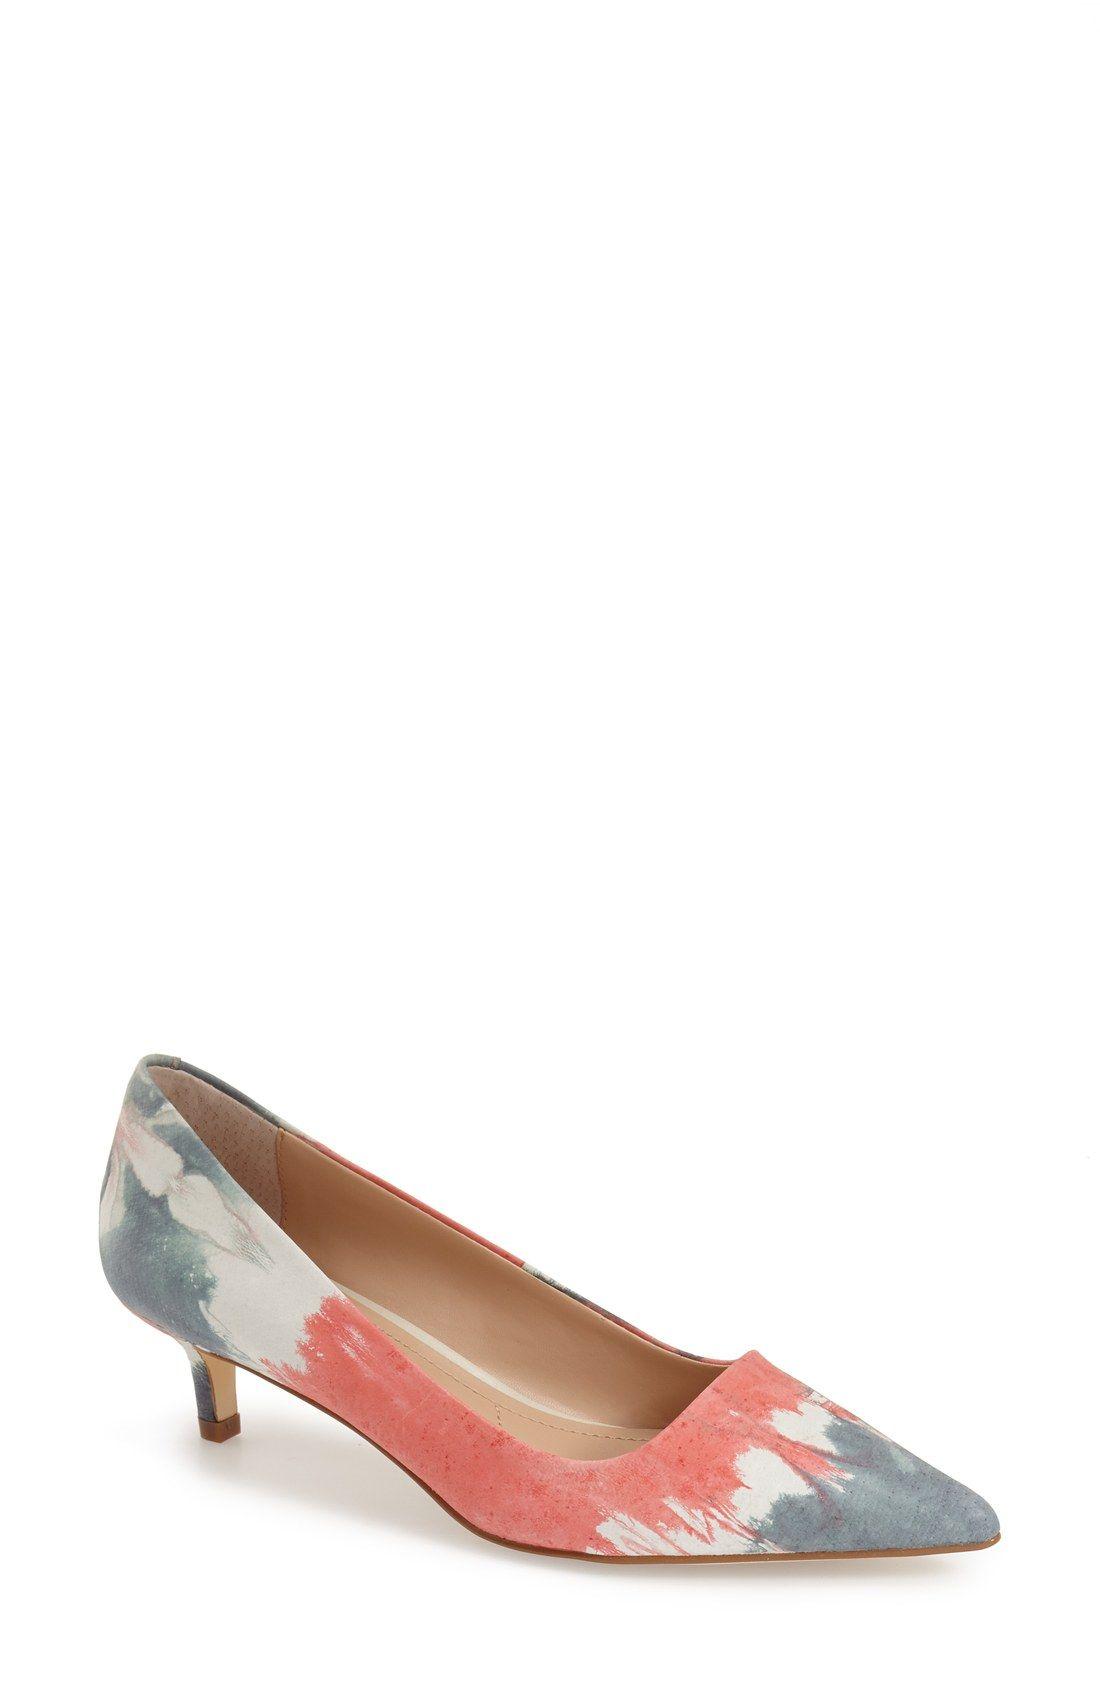 Charles By Charles David Drew Kitten Heel Pump Women Zapatos